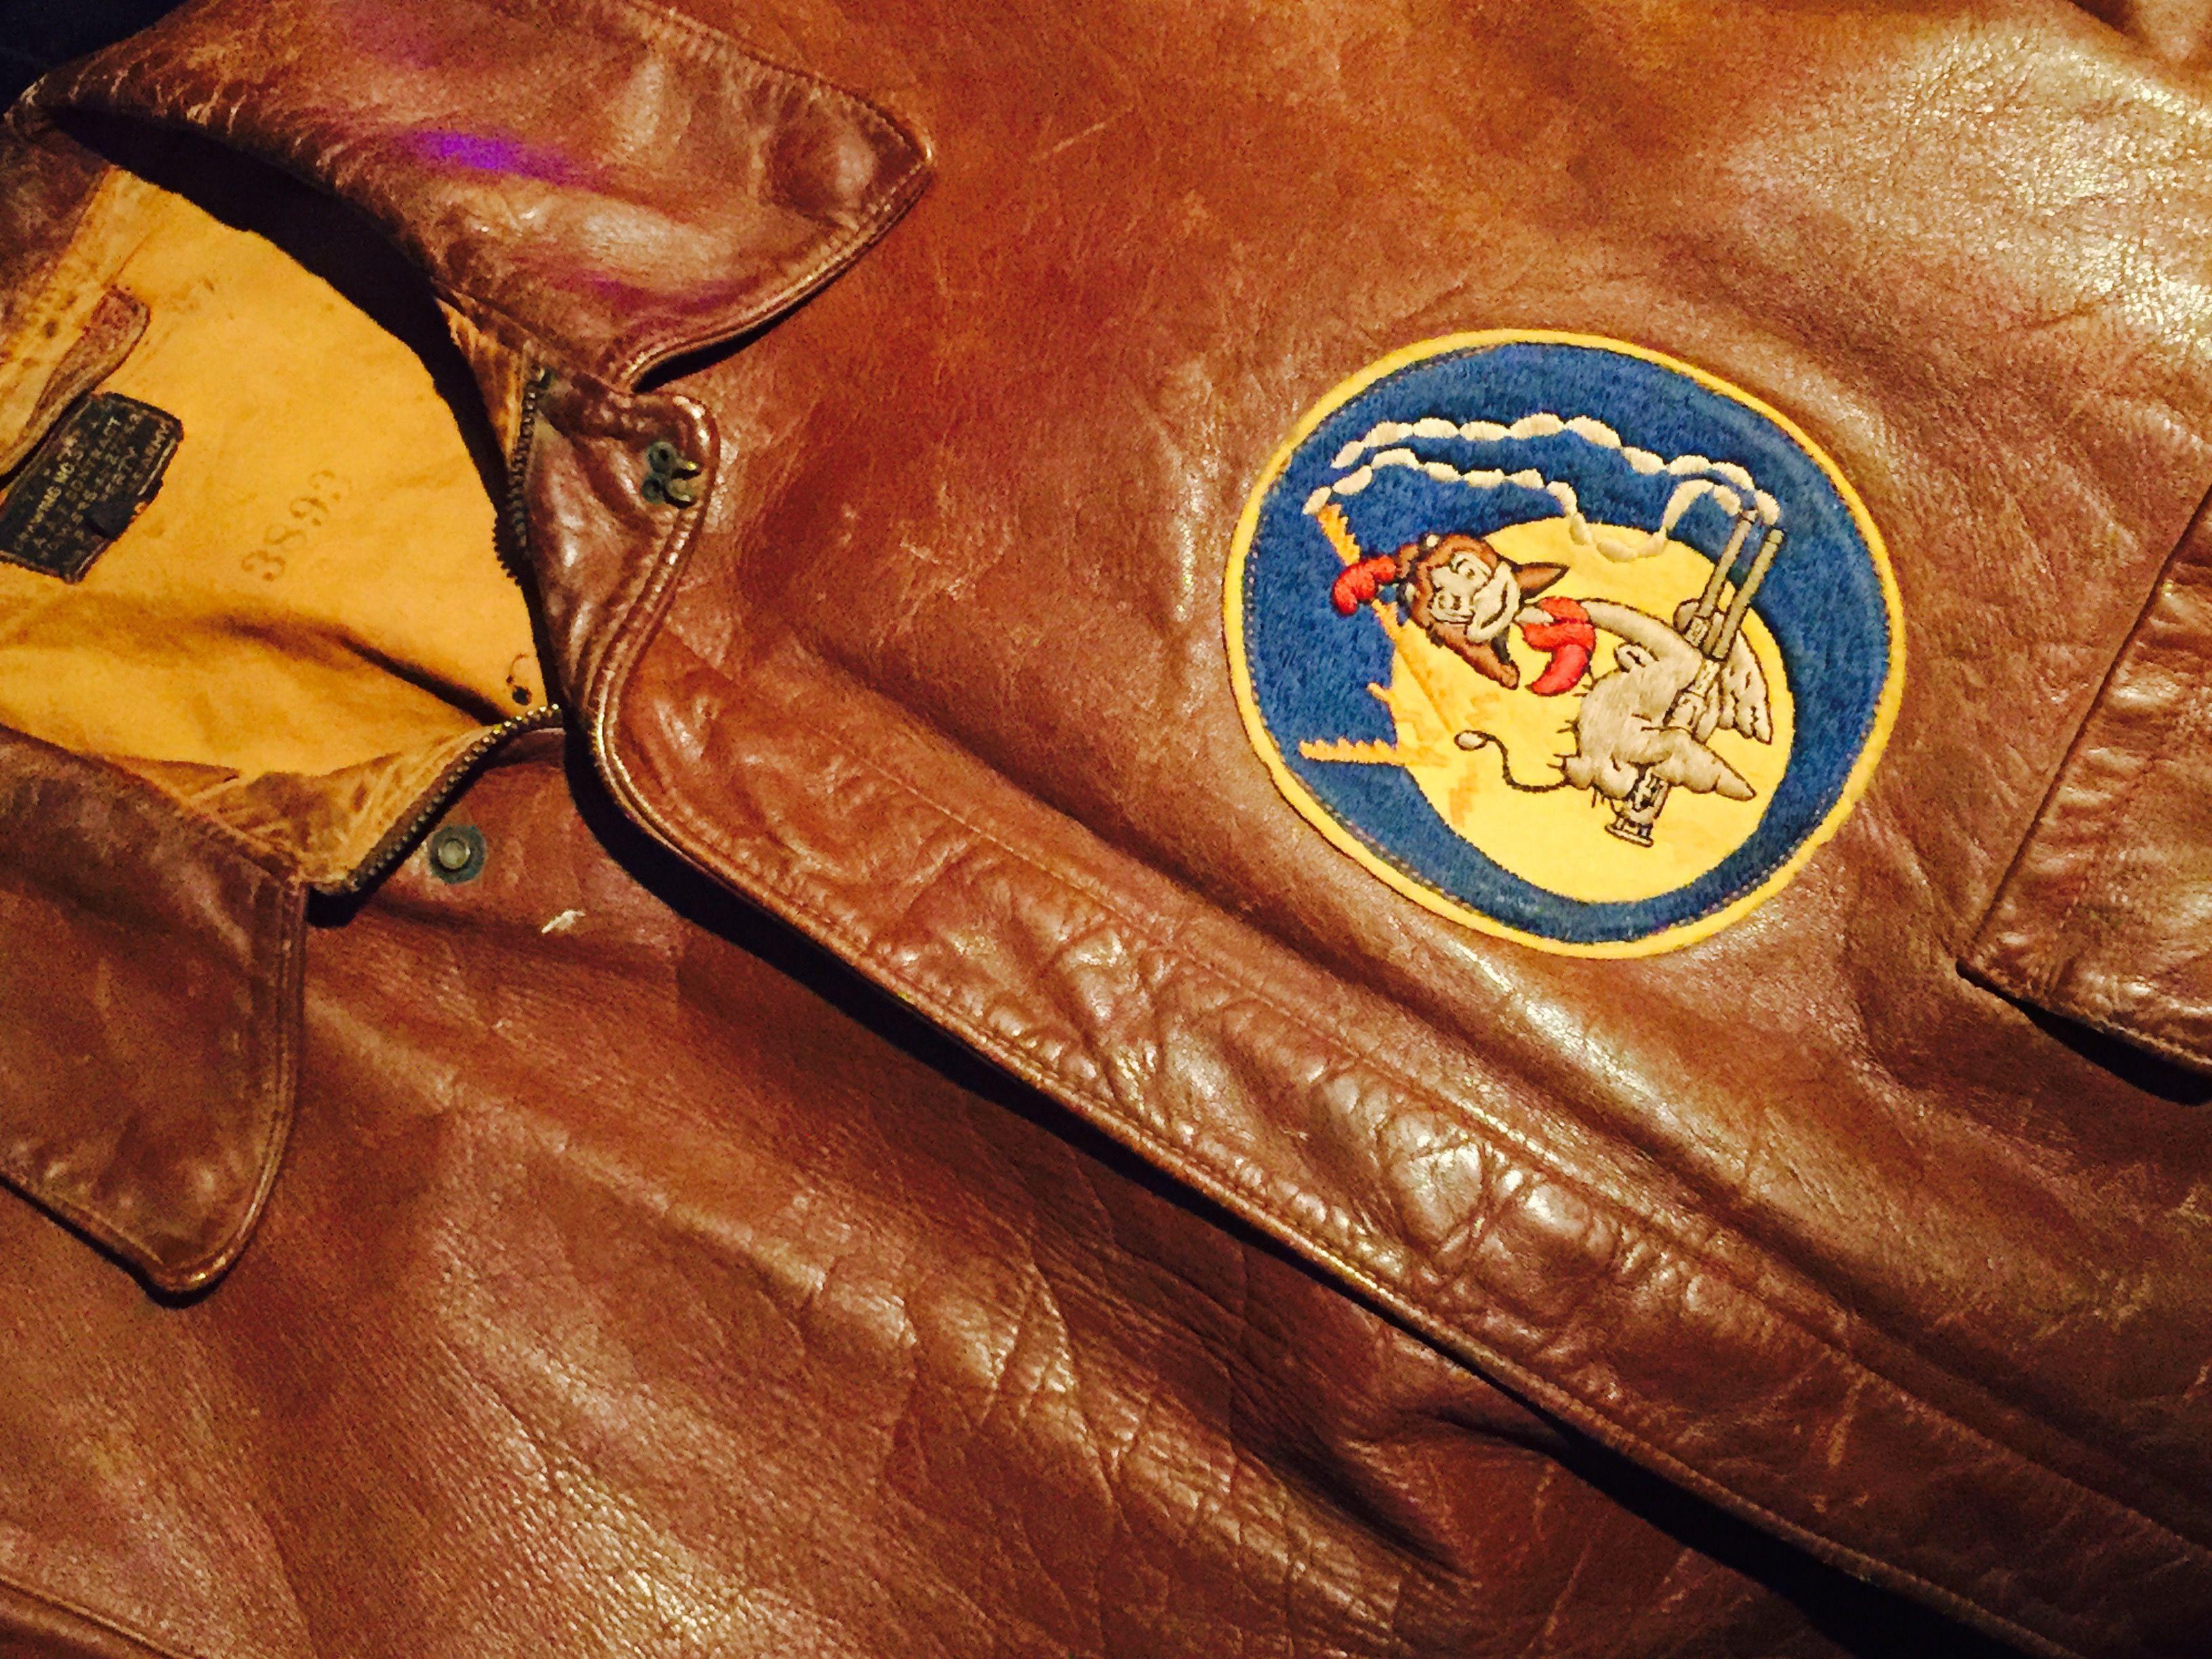 Pin By Spencer Hoglund On Flight Jackets Wwii Bomber Jacket Flying Jacket Leather Flight Jacket [ 2448 x 3264 Pixel ]